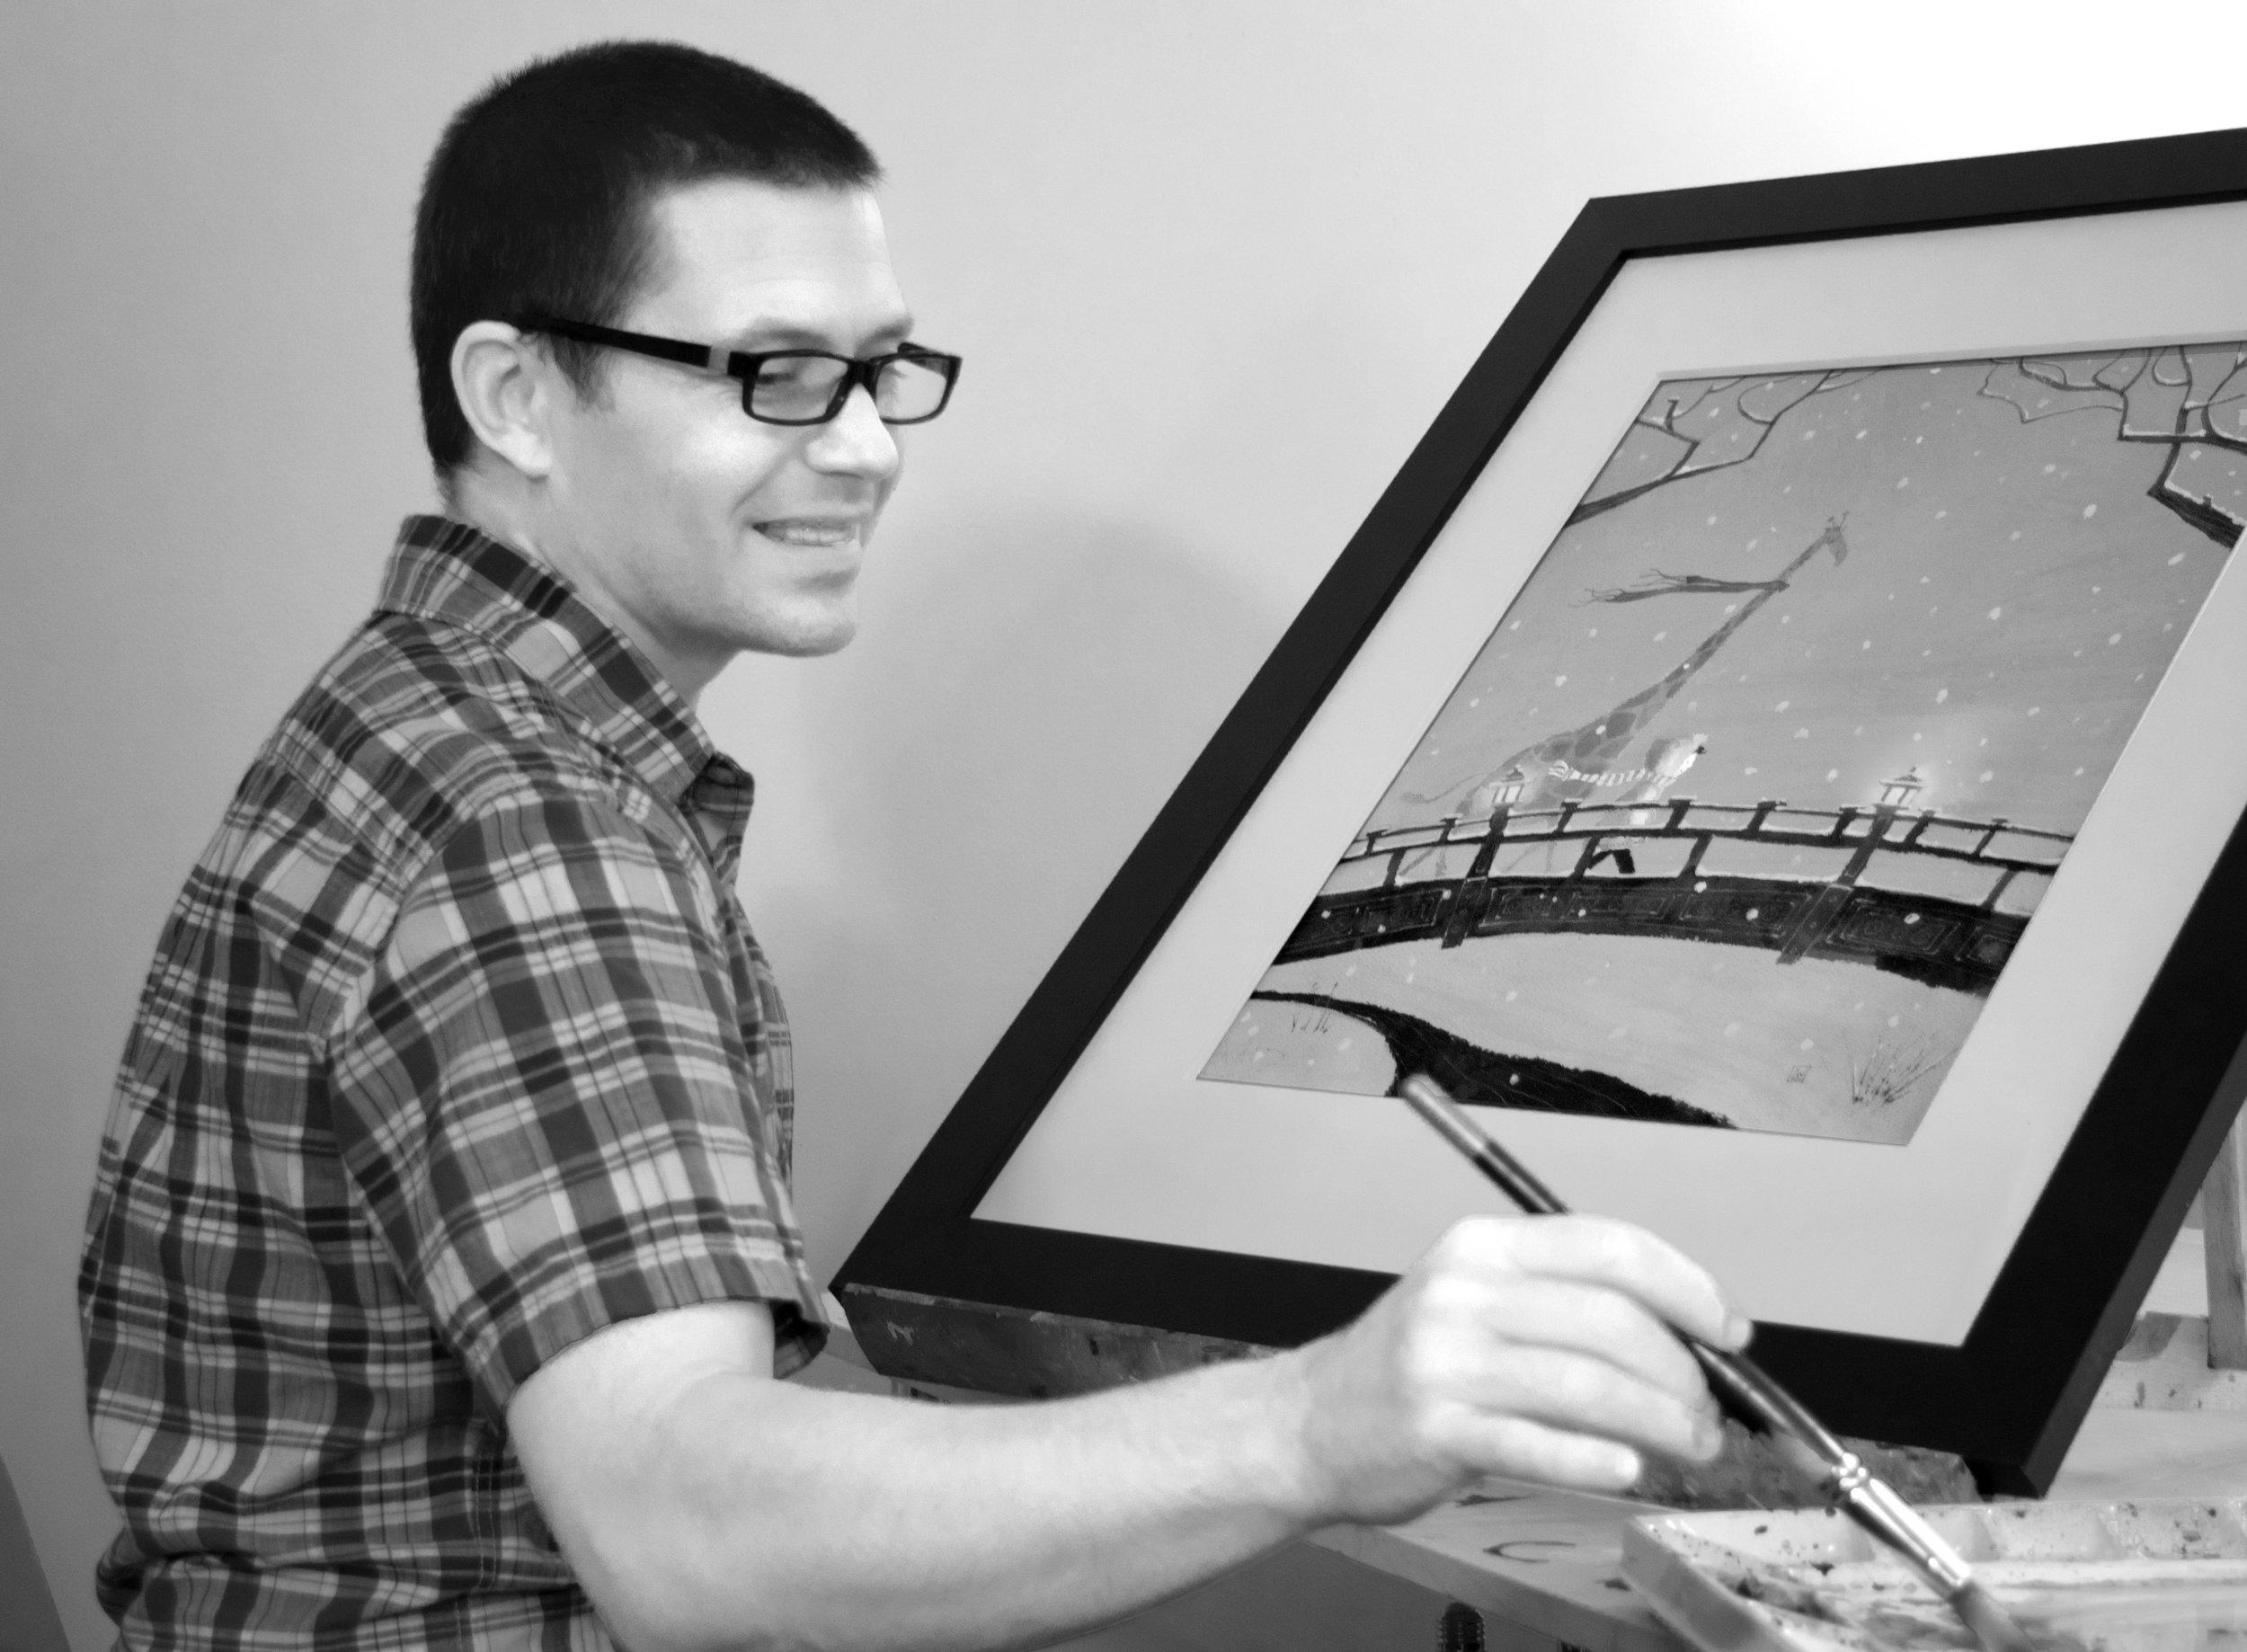 Working on my 1940's illustrator look